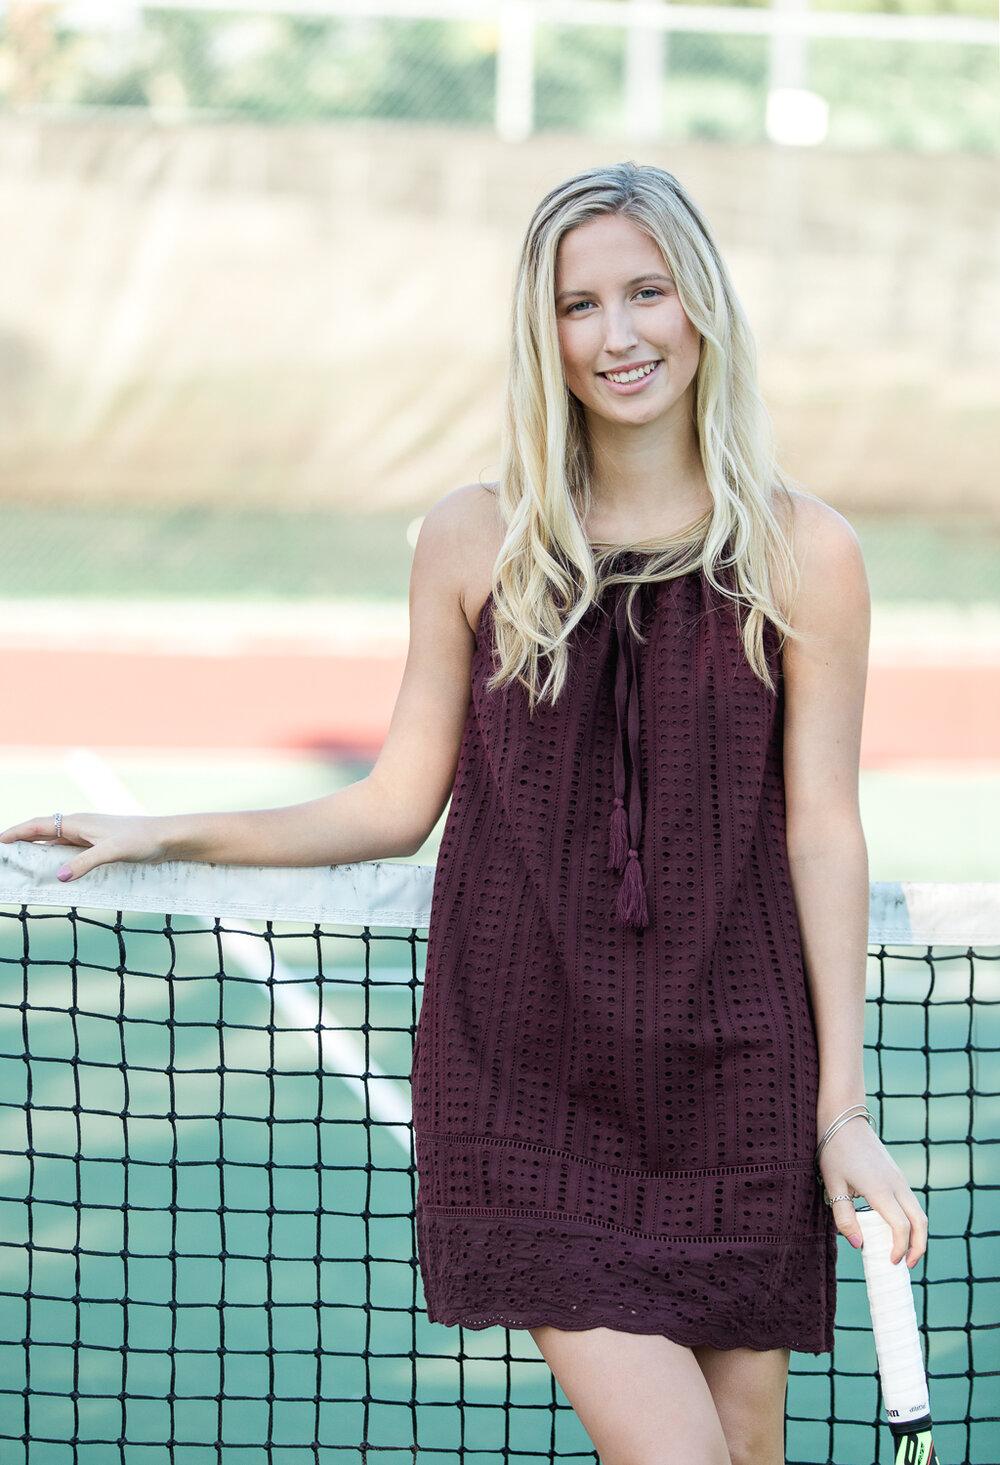 high school senior posing at the tennis court